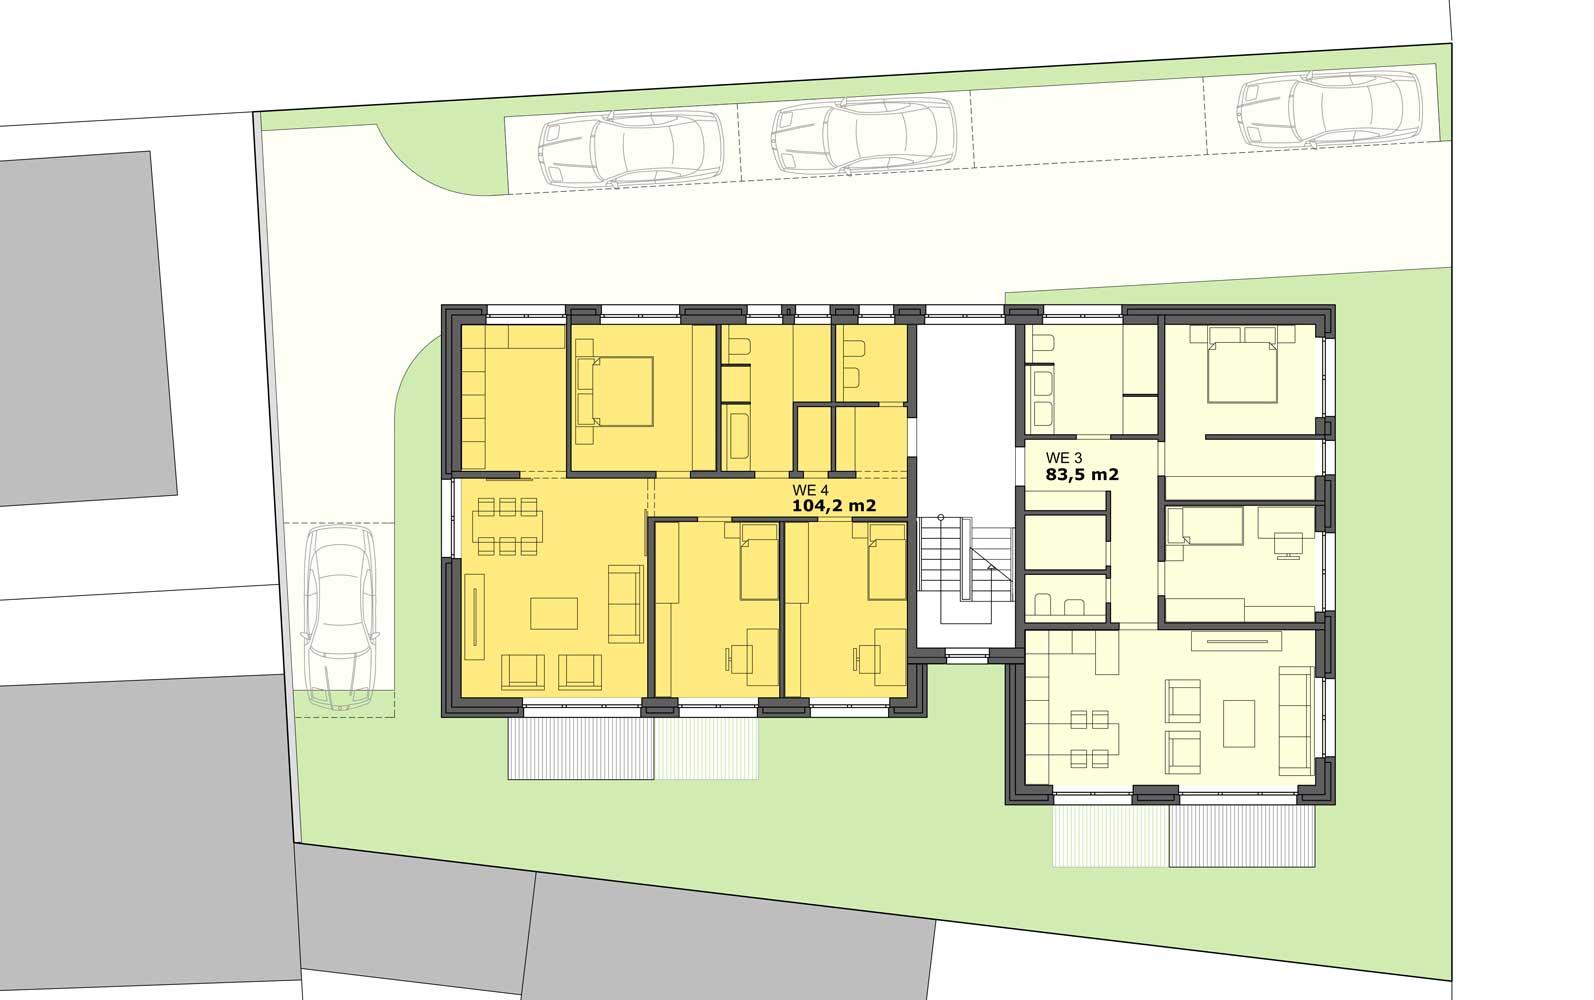 neubau mehrfamilienhaus querum bs sabi architekten partgmbb. Black Bedroom Furniture Sets. Home Design Ideas